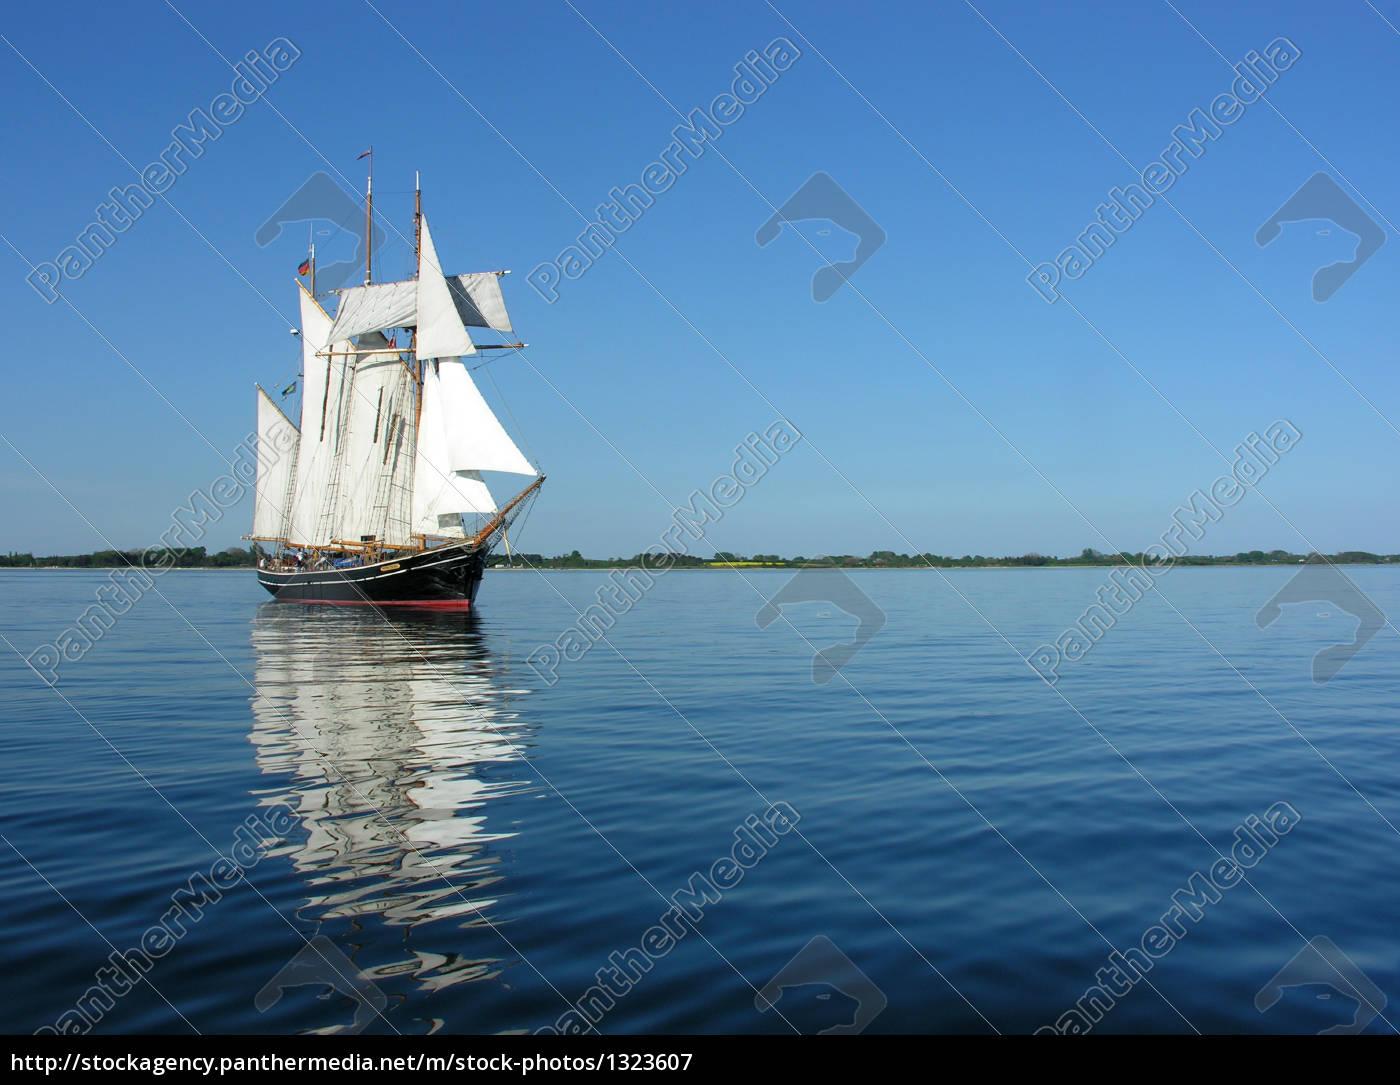 three-masted, topsail, schooner, albatros - 1323607